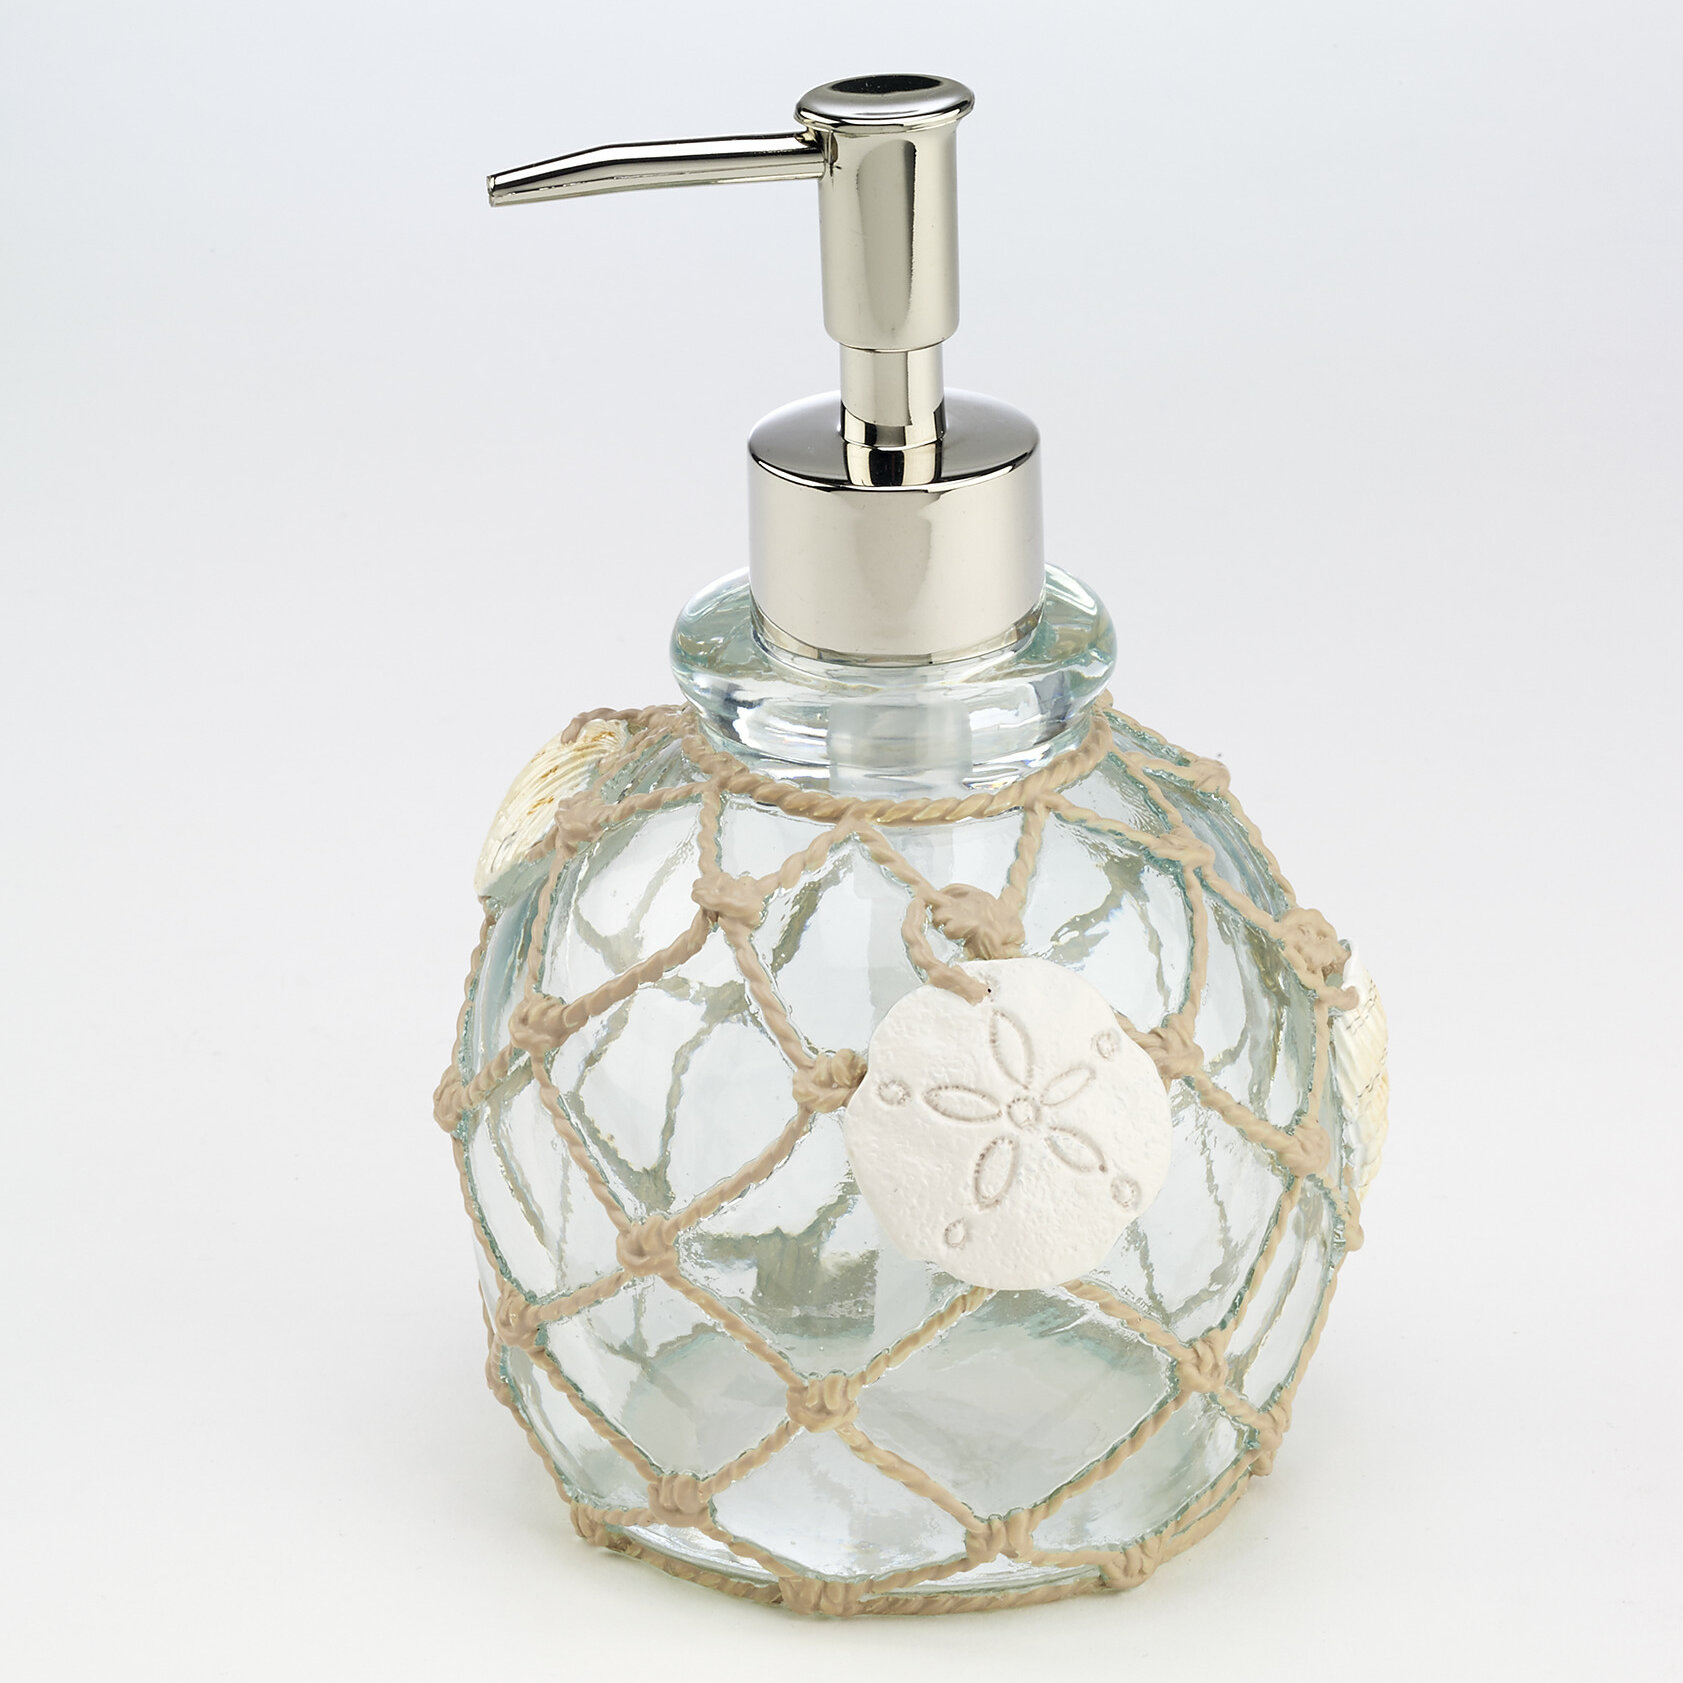 Avanti Linens Seaglass Lotion And Soap Dispenser Reviews Wayfair Ca